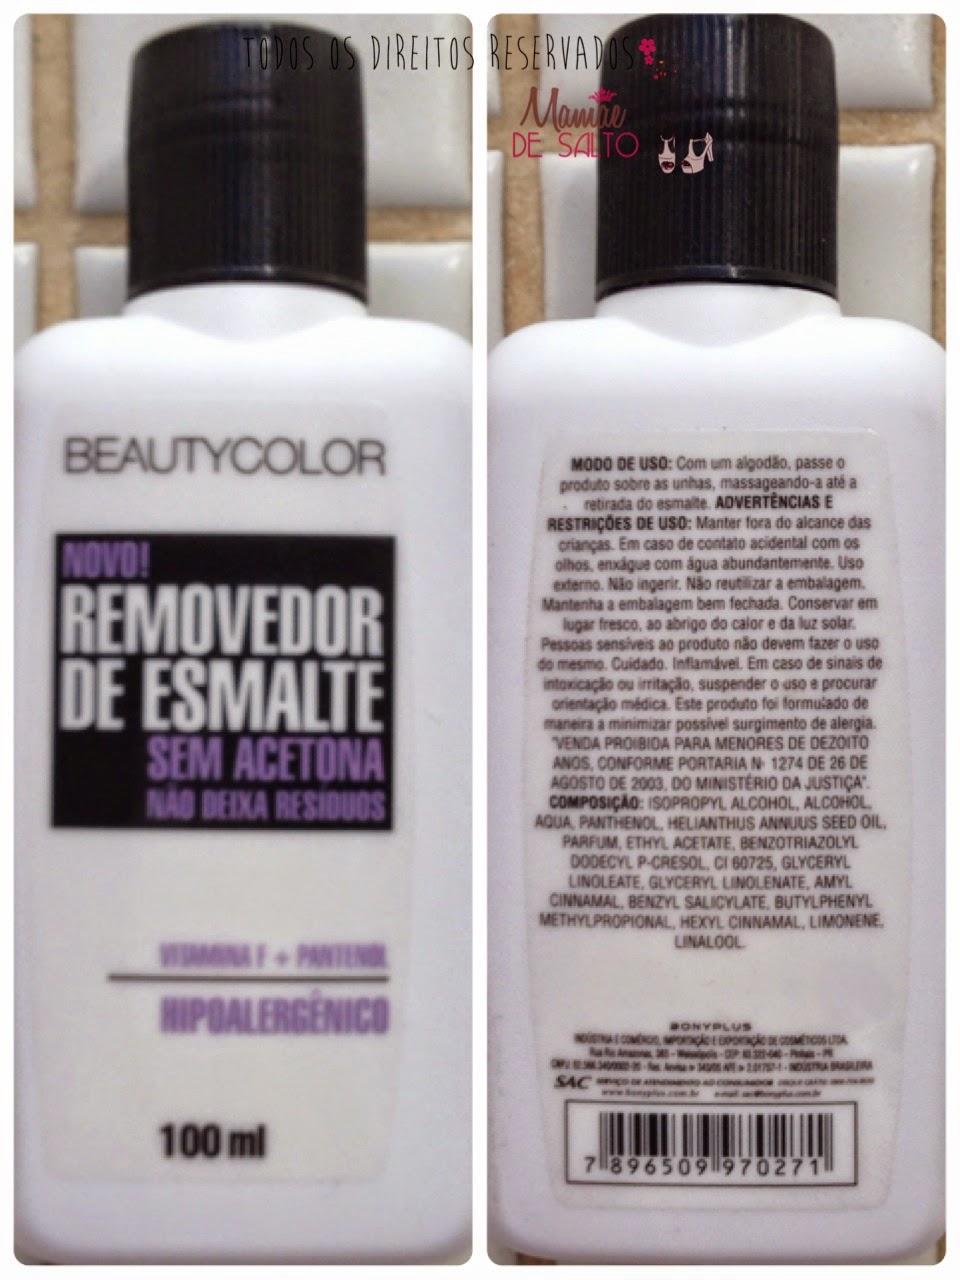 removedor de esmalte sem acetona Beauty Color - blog Mamãe de Salto